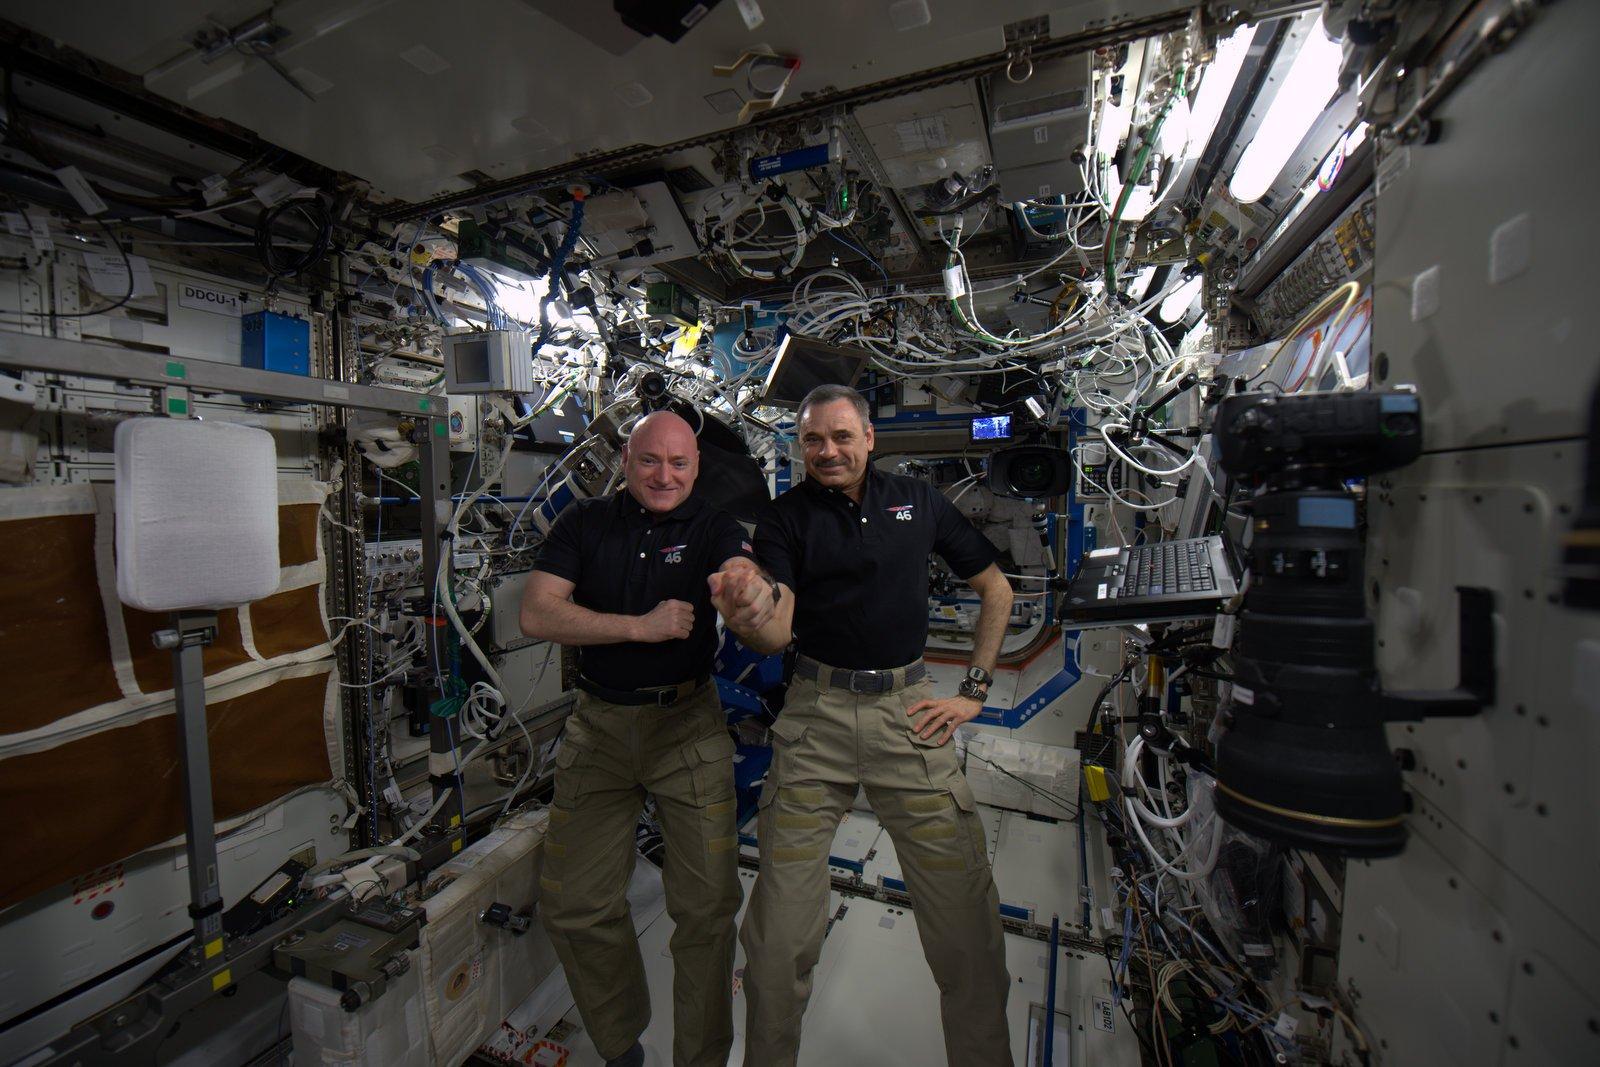 Séjour d'un an dans l'ISS - Page 7 CZRYyWIUMAAqKiR